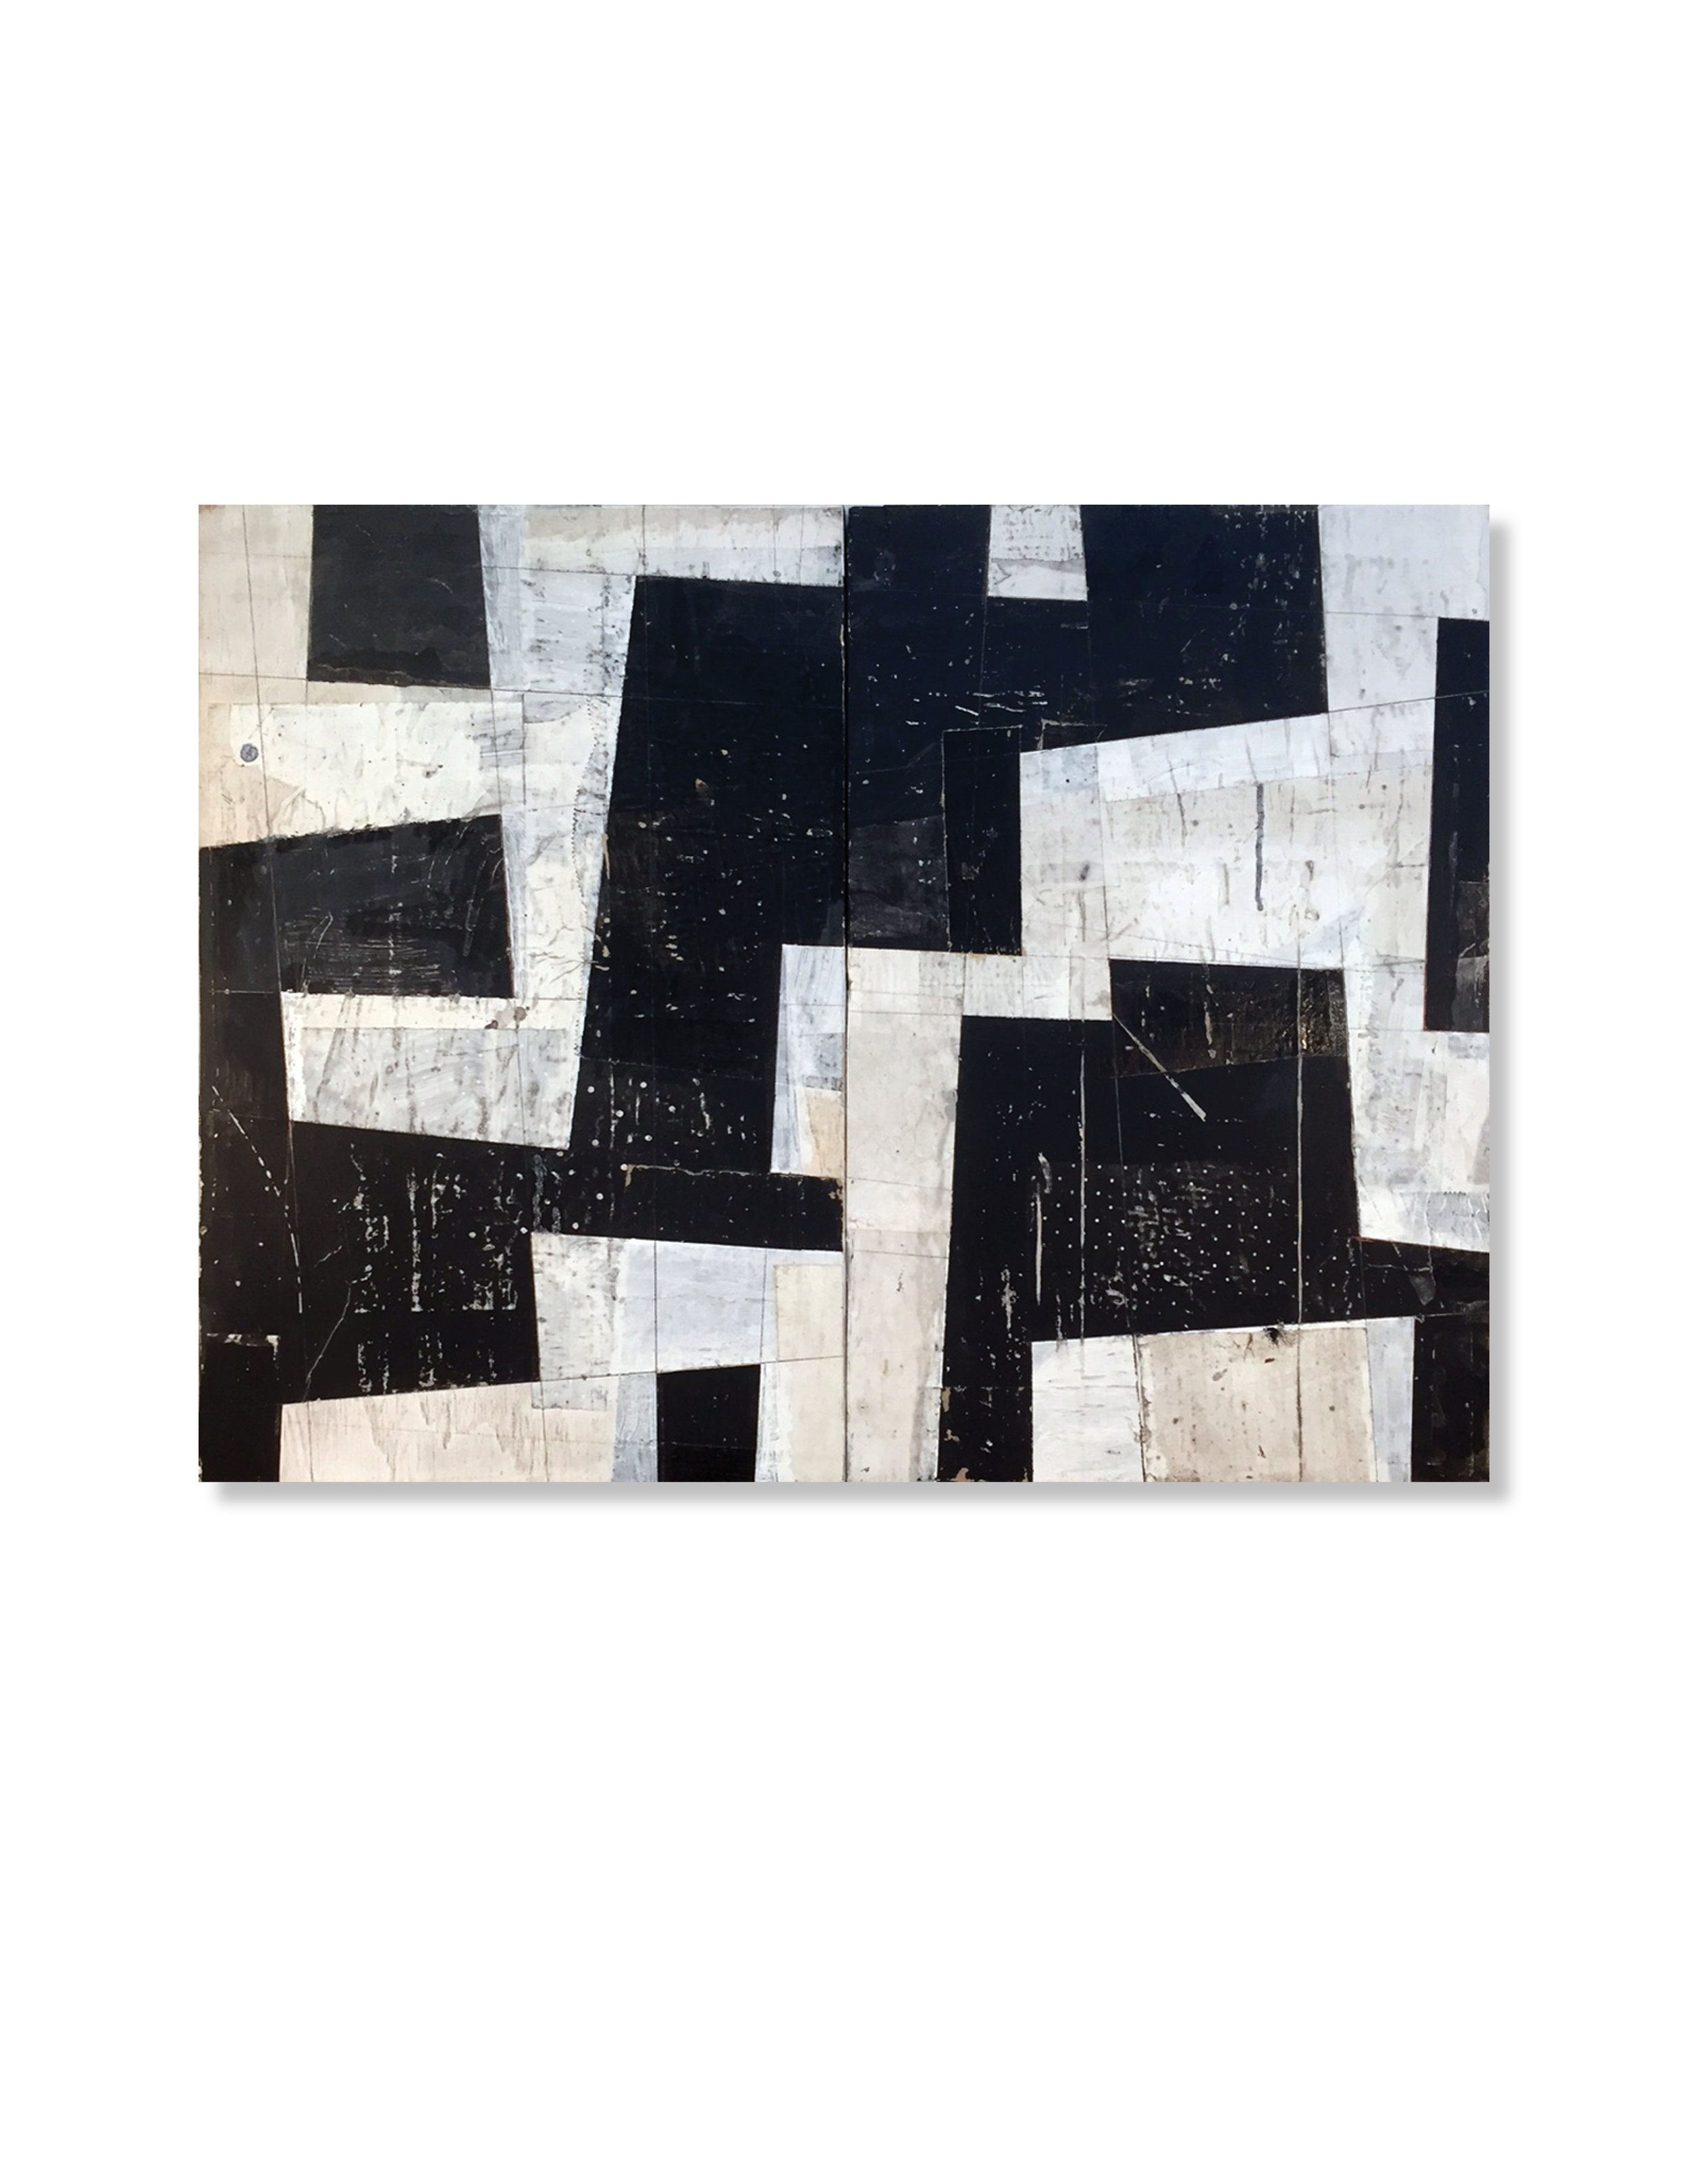 Black + White Diptych 1